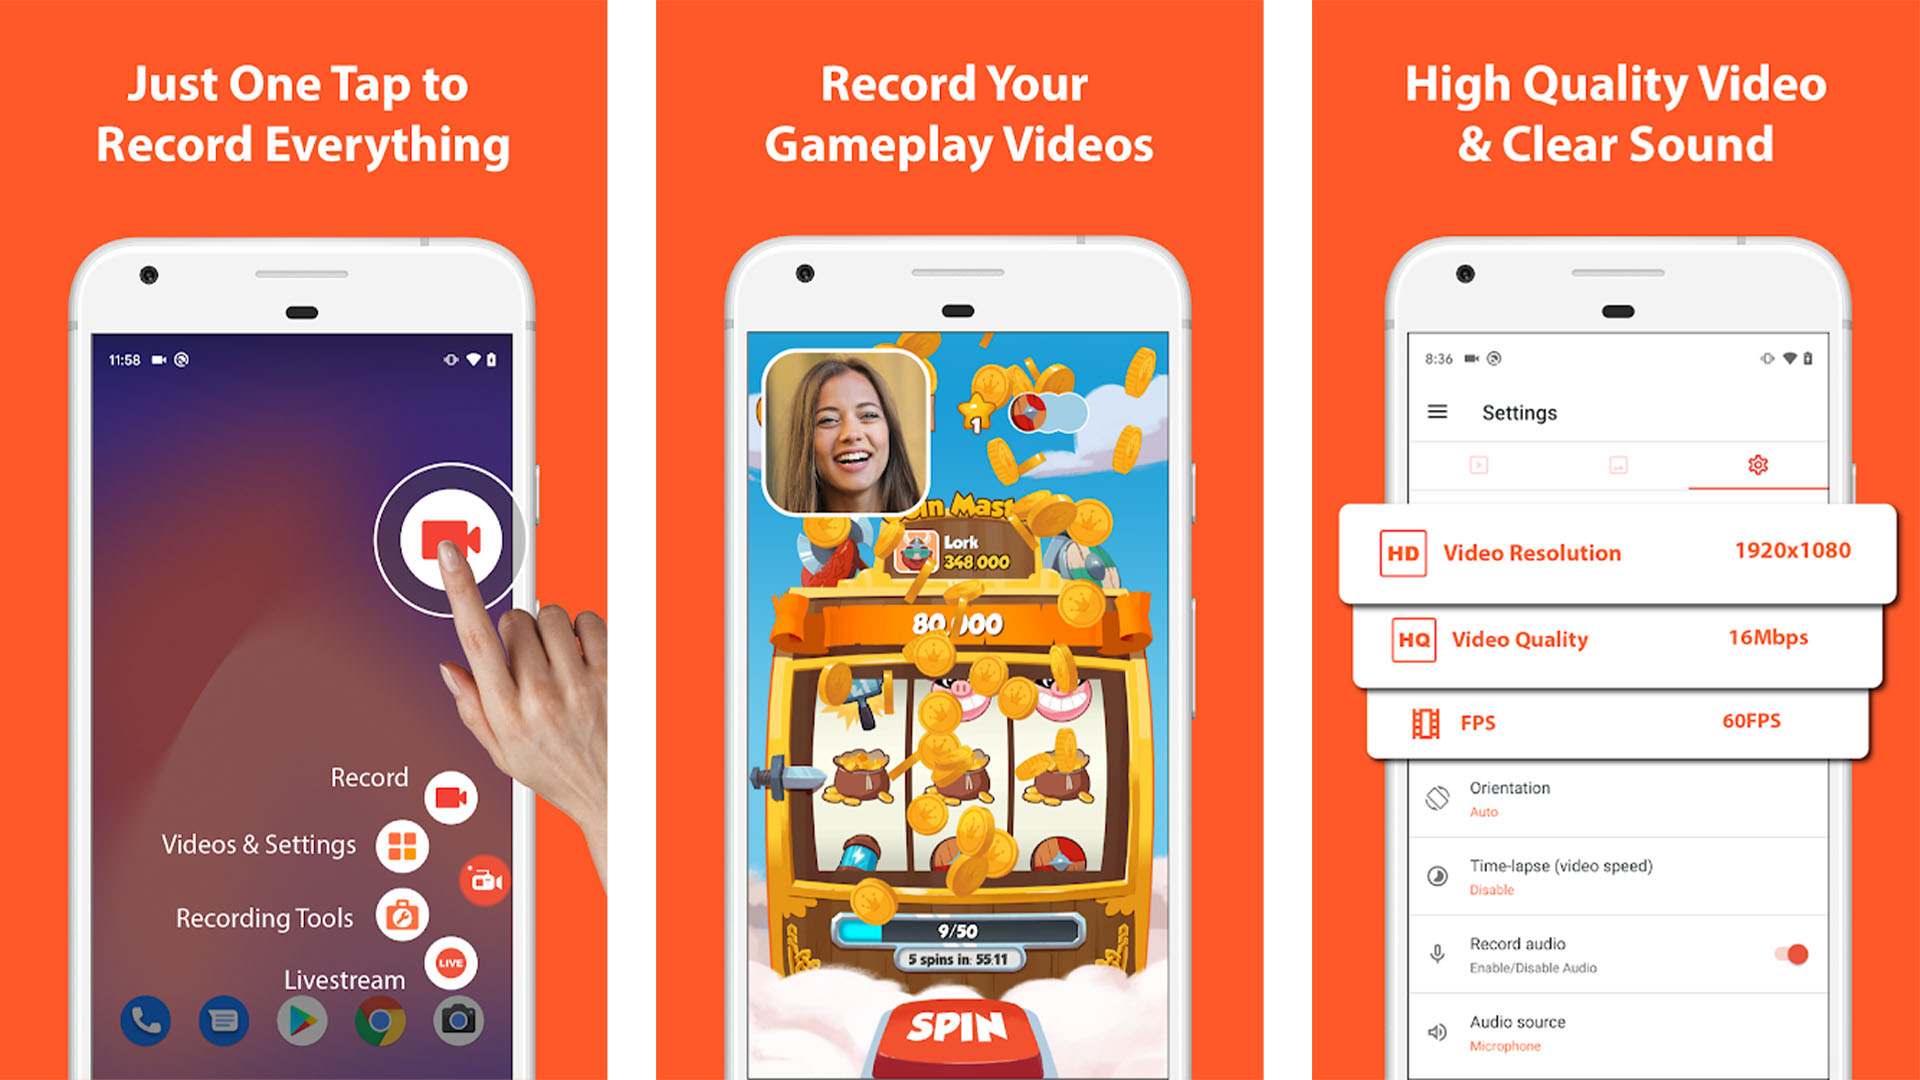 AZ Screen Recorder screenshot 2020